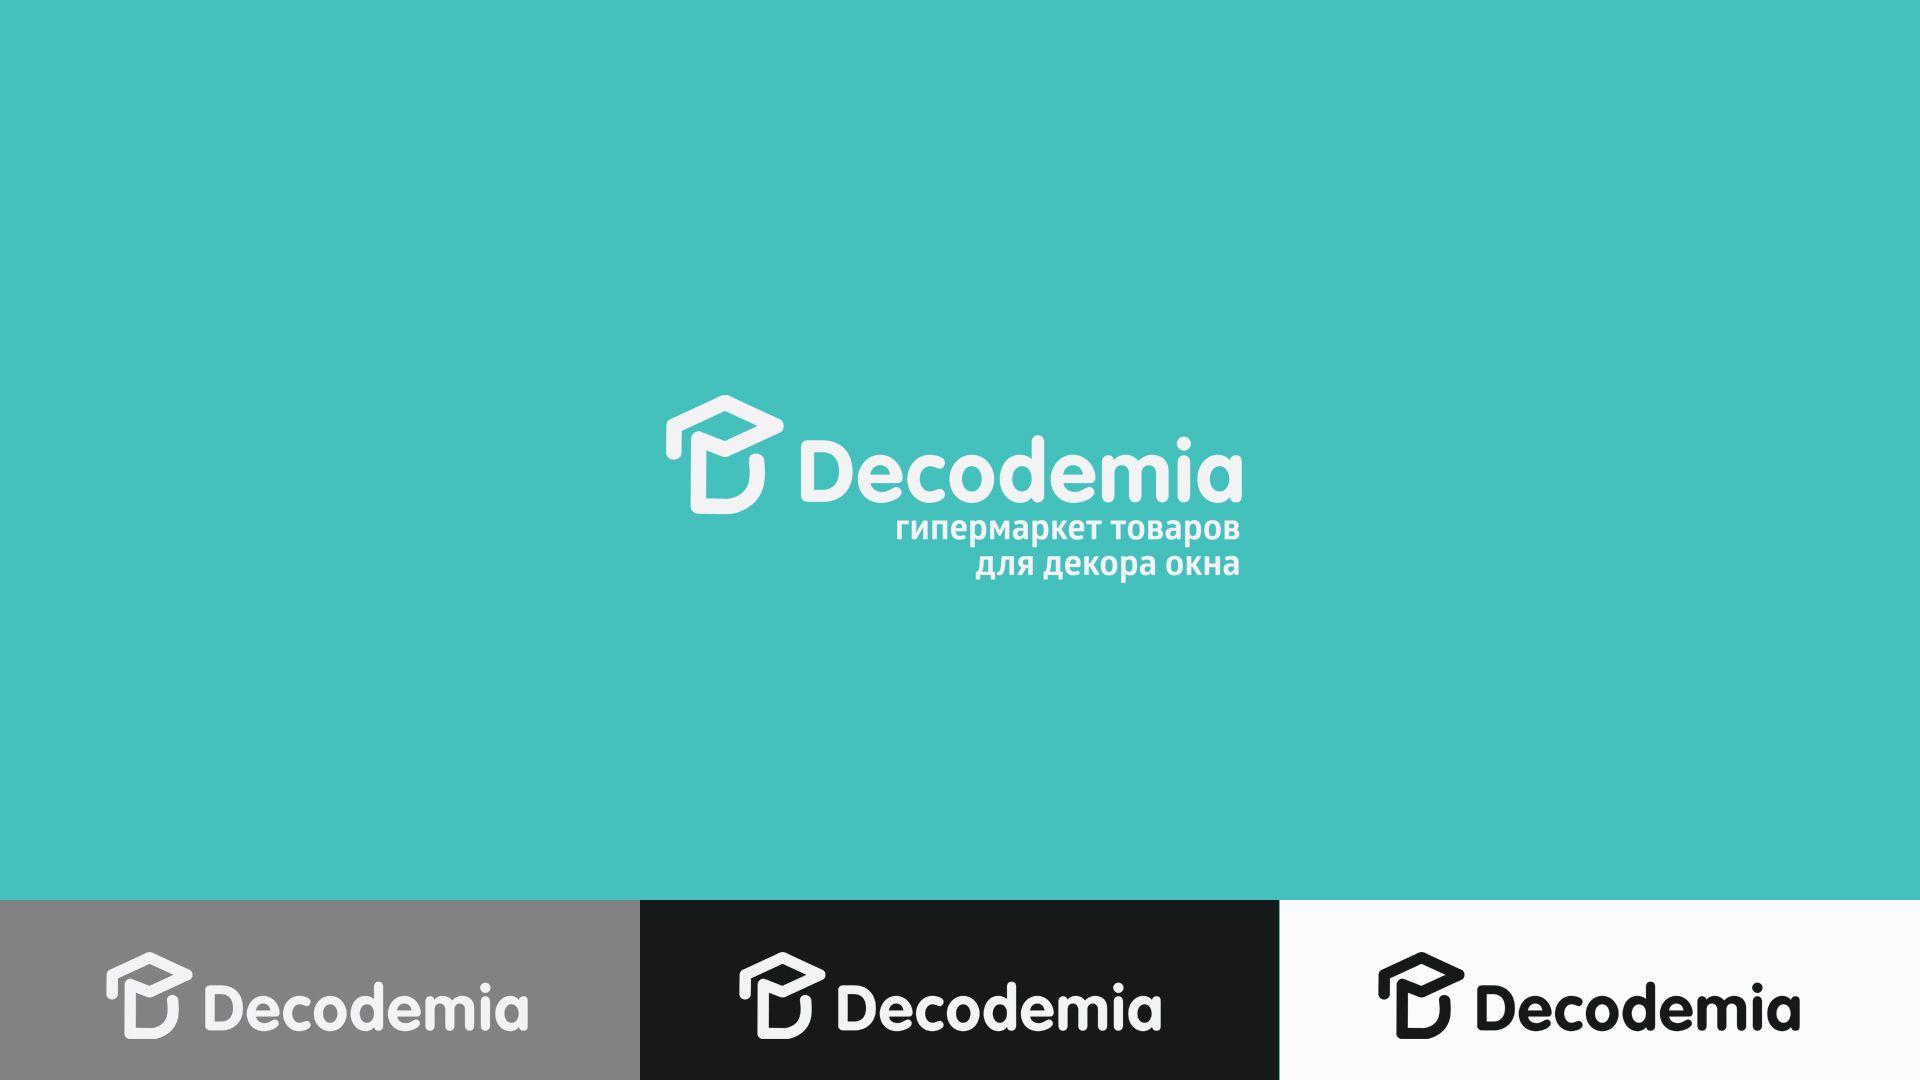 Логотип интернет-магазина  - дизайнер drawmedead